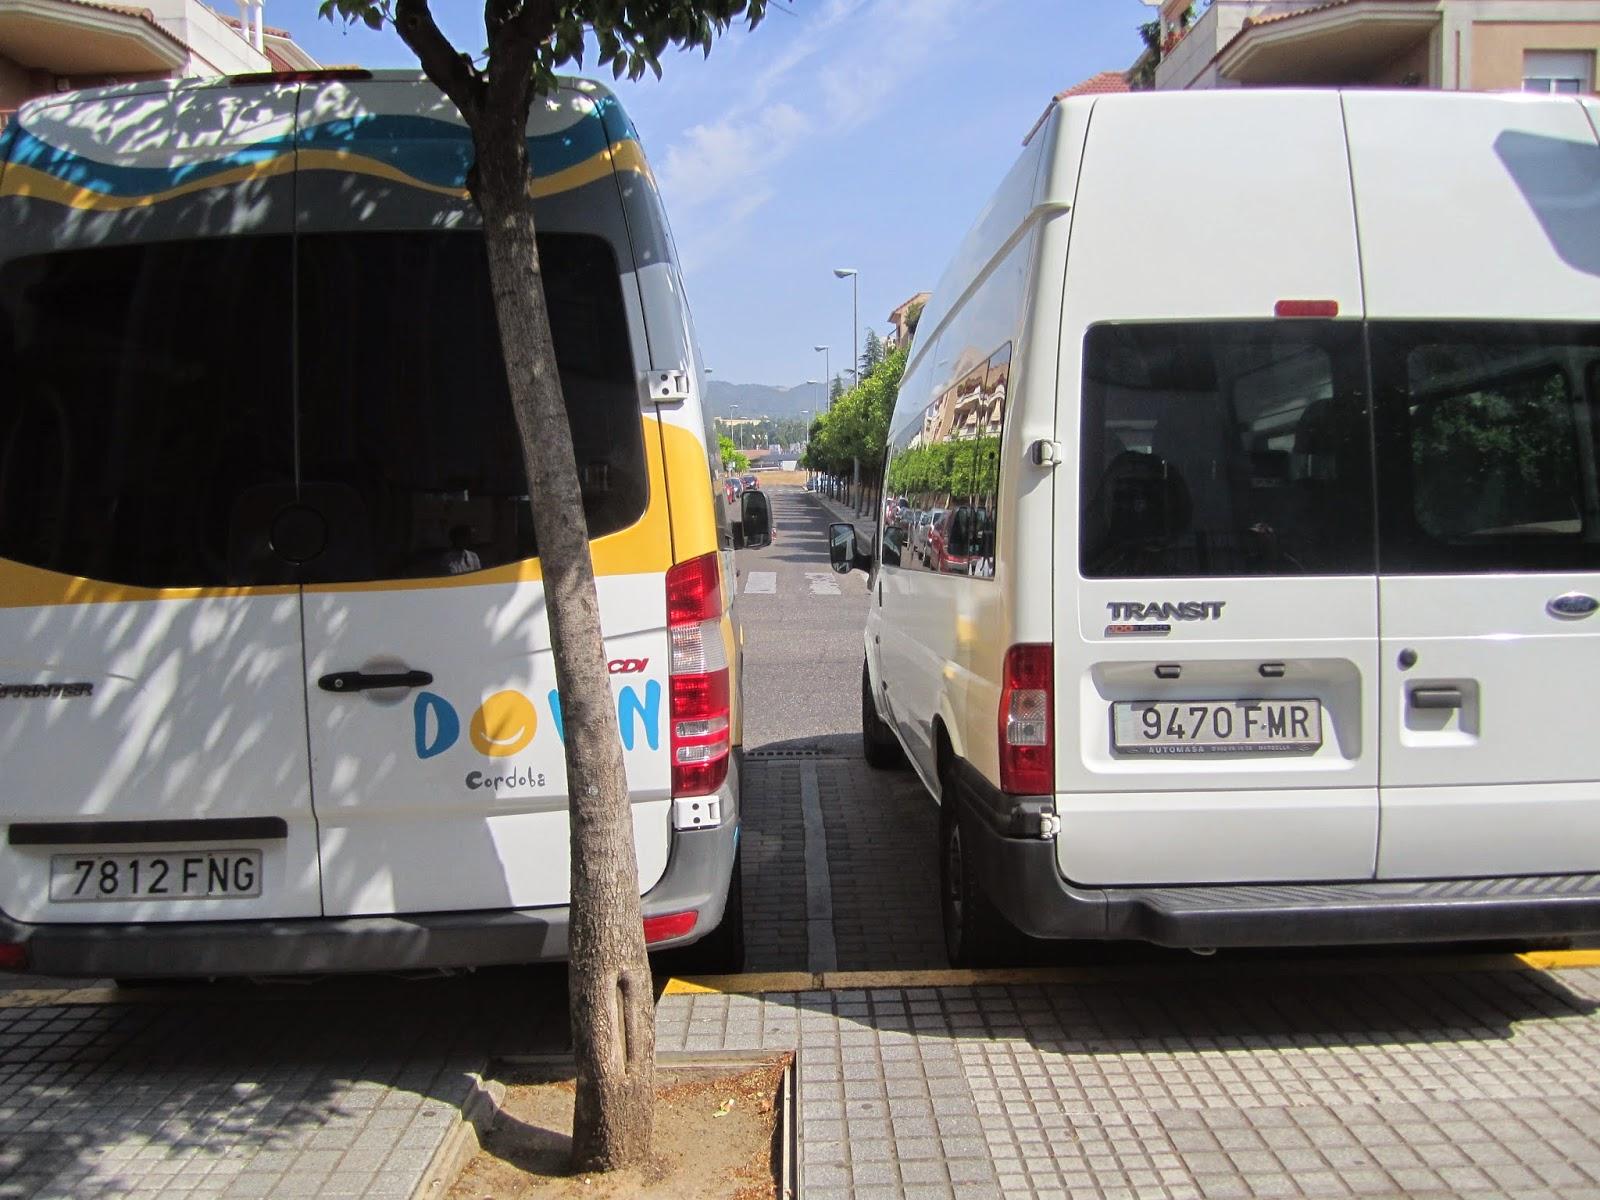 Entre furgonetas queda un espacio aproximado de 80 centímetros.